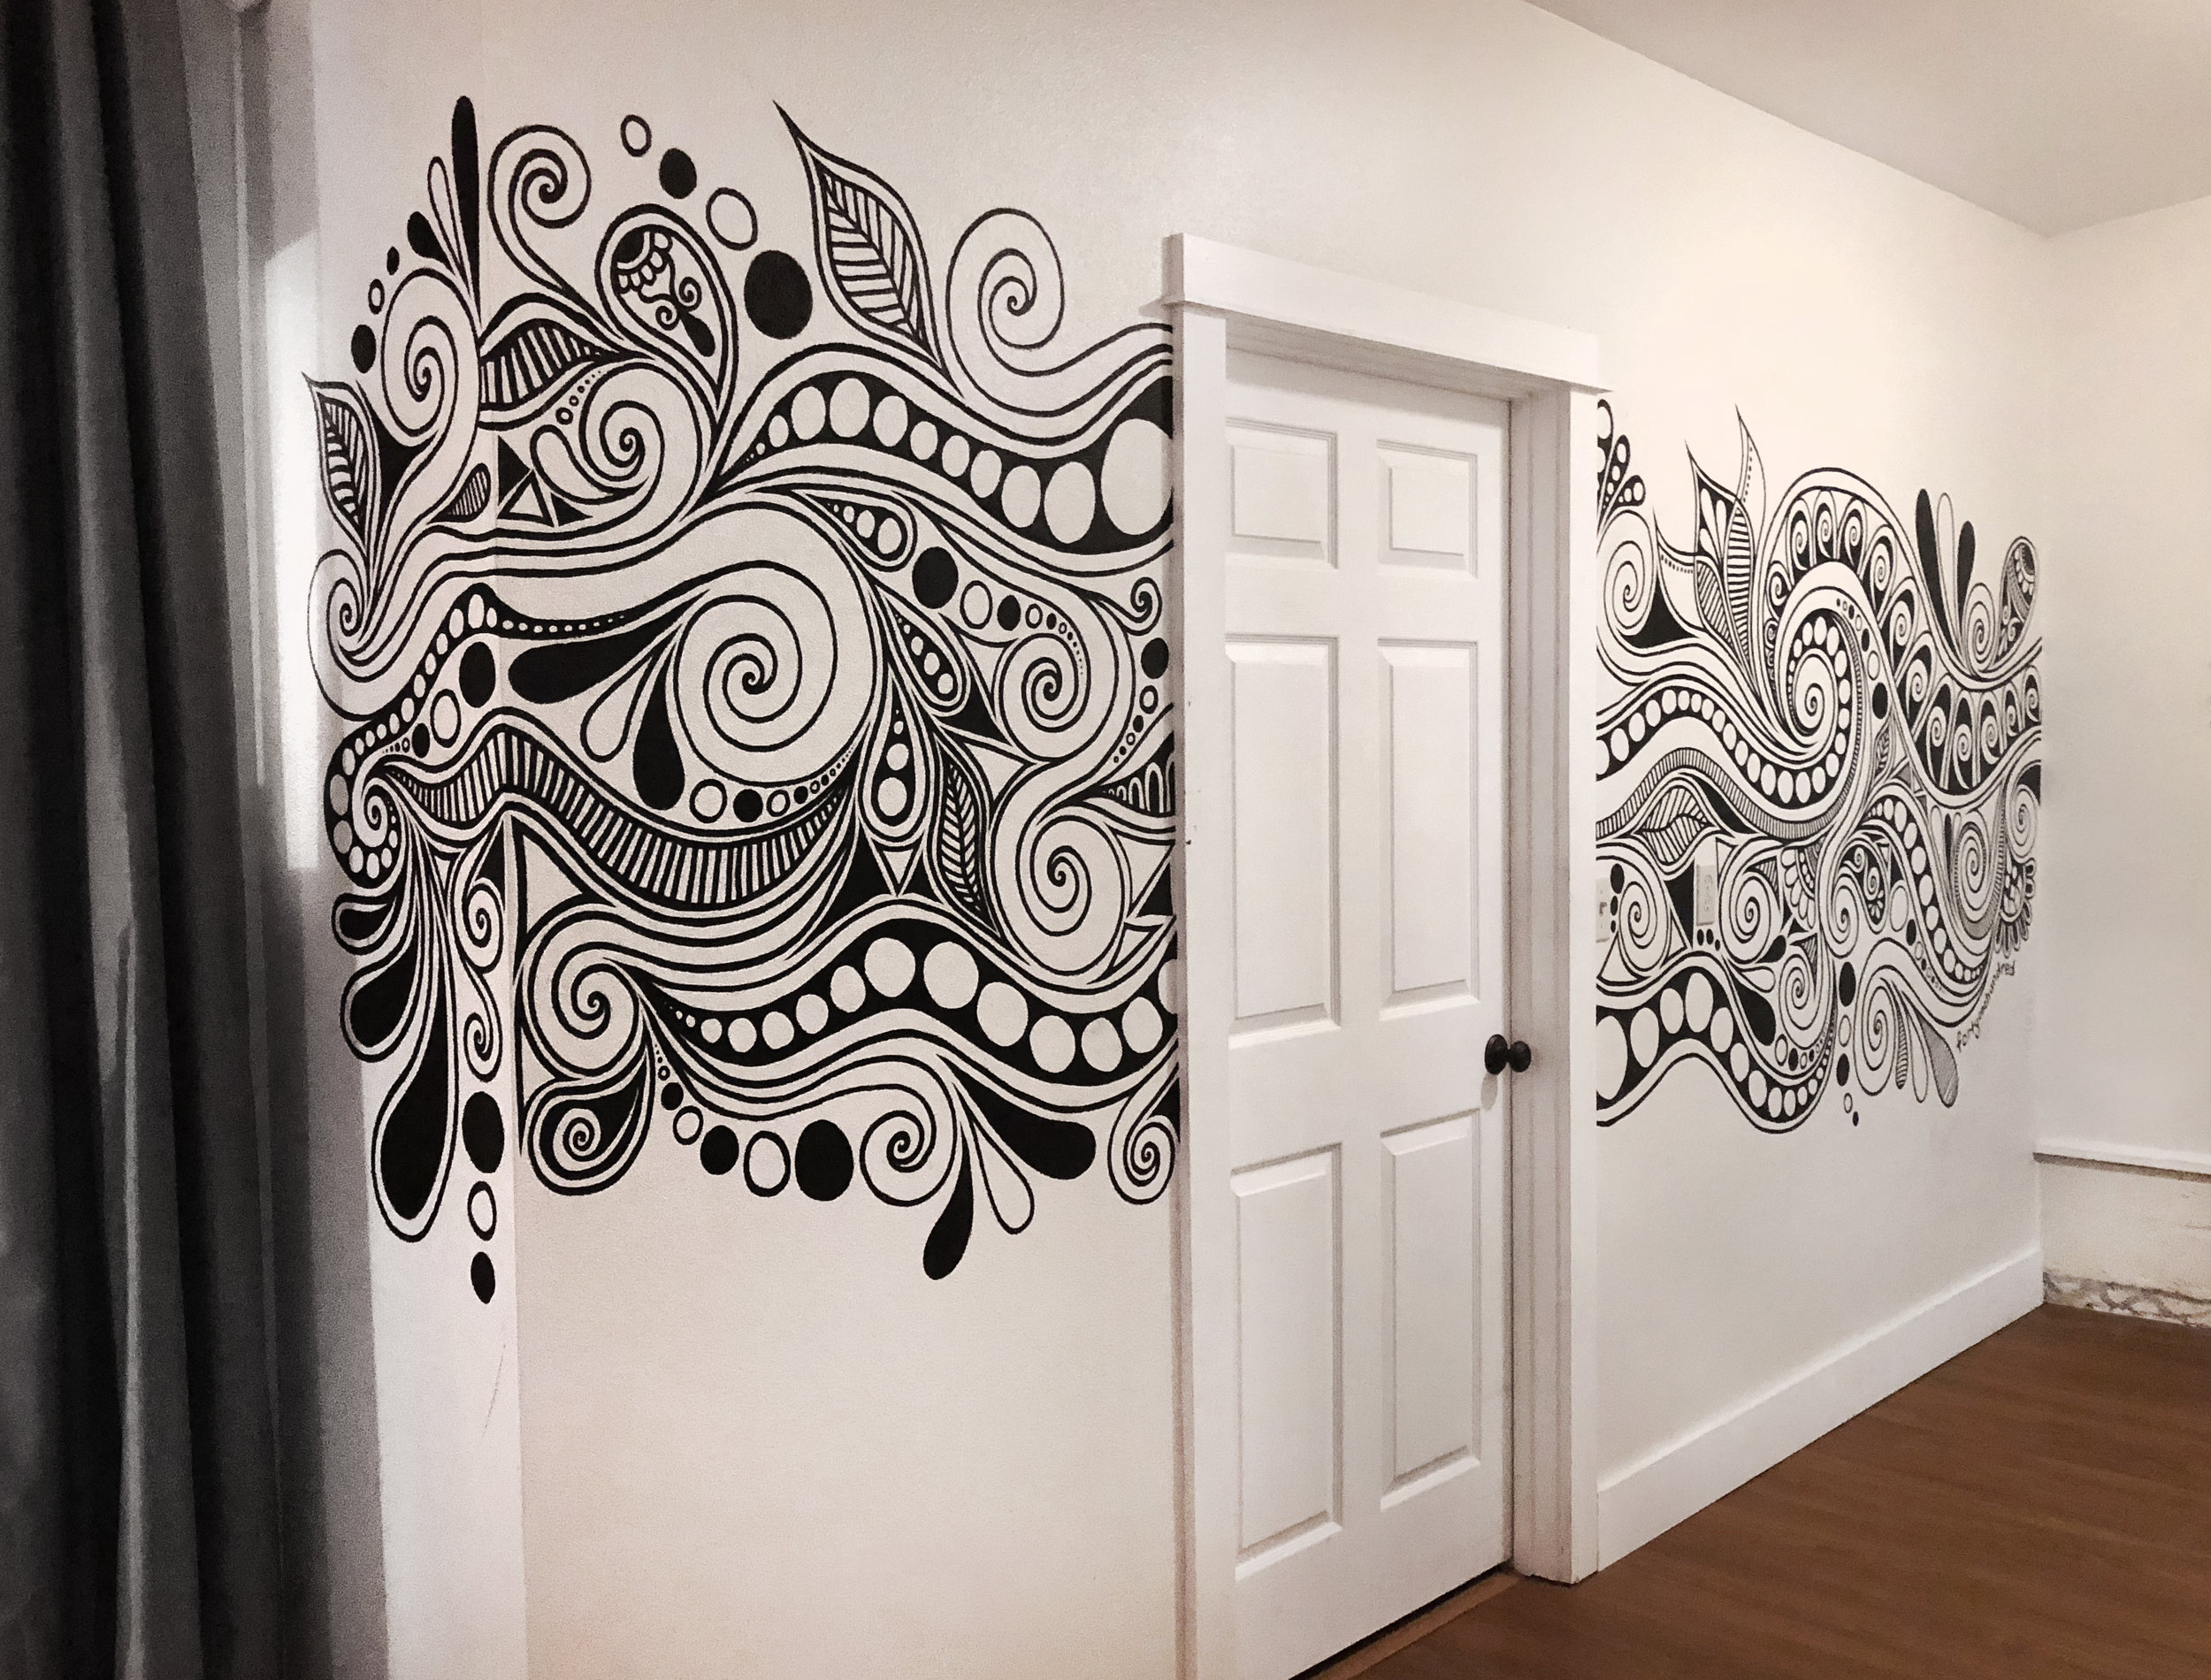 AfterGlowYoga-Mural2.jpg